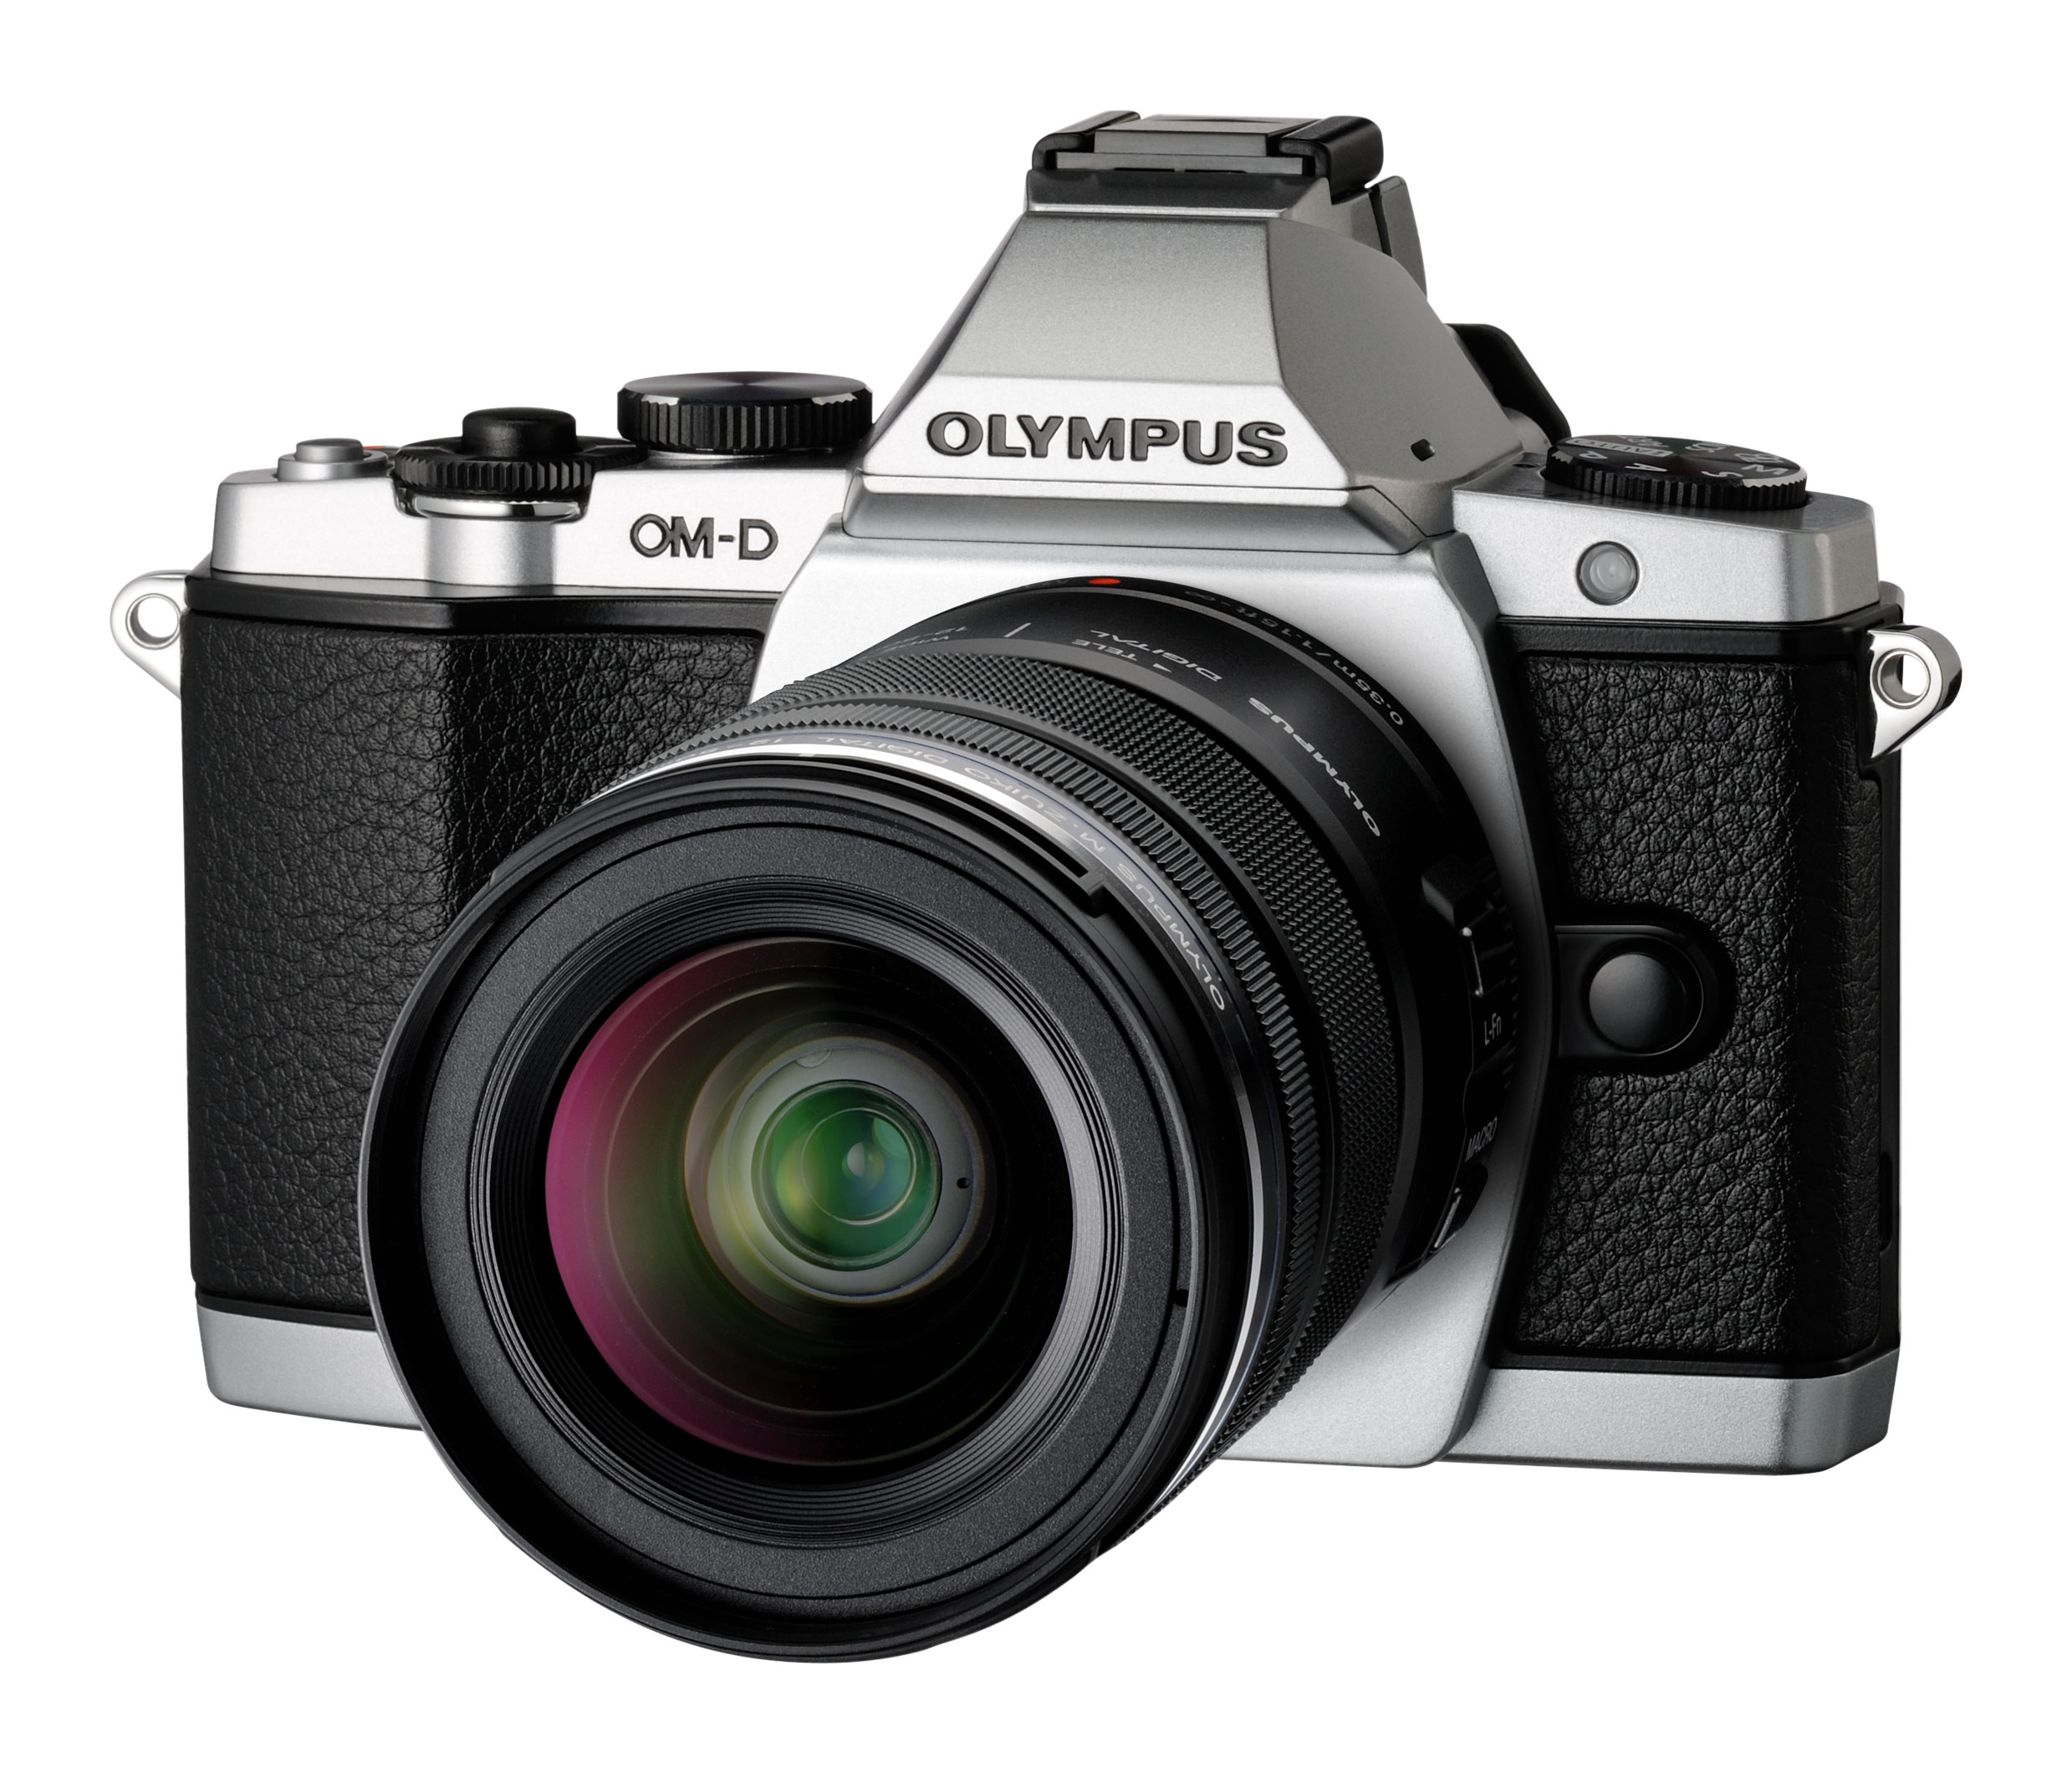 Camera Olympus Dslr Camera Reviews olympus best digital slr camera reviews om d photography playground at the berlin